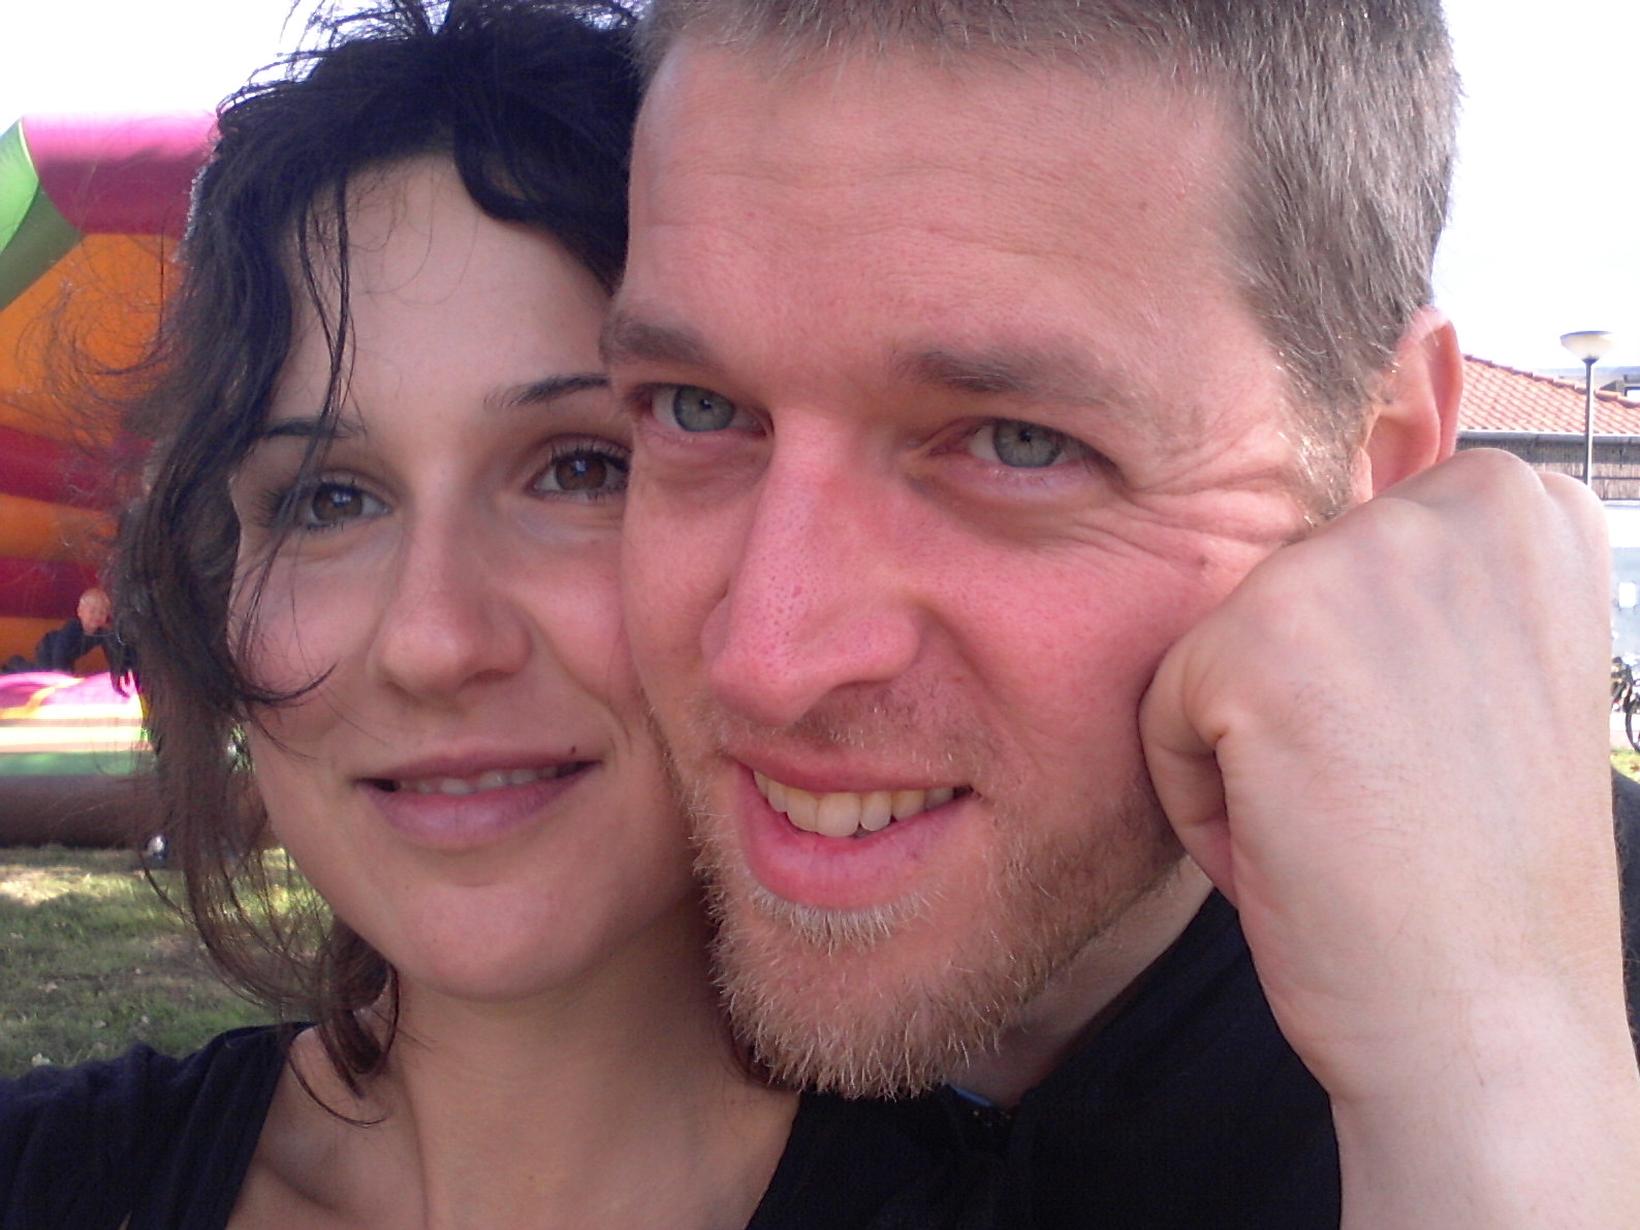 Rocio & Martijn from 's-Hertogenbosch, Netherlands